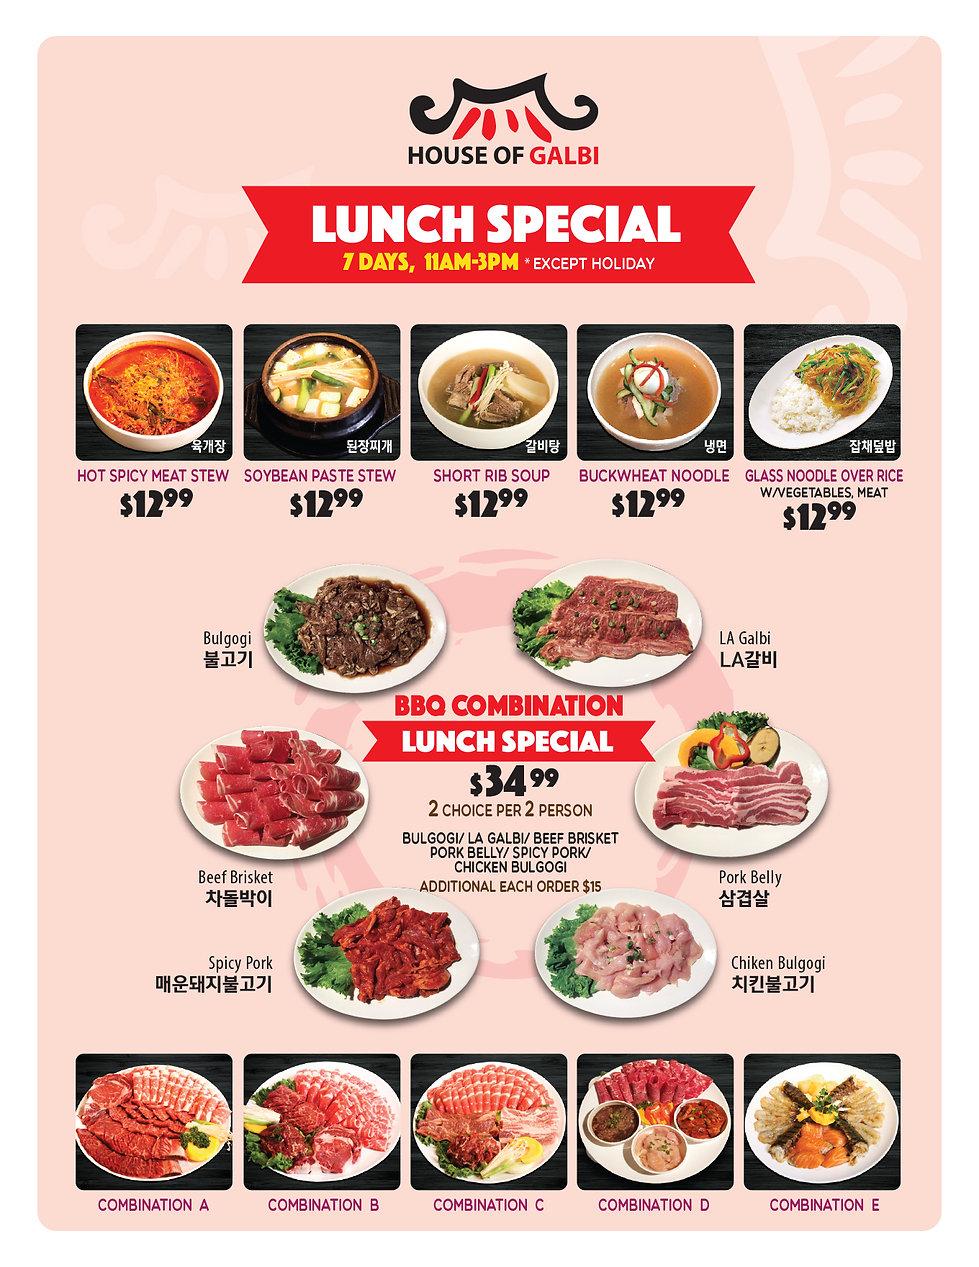 LunchSpecial2020.jpg